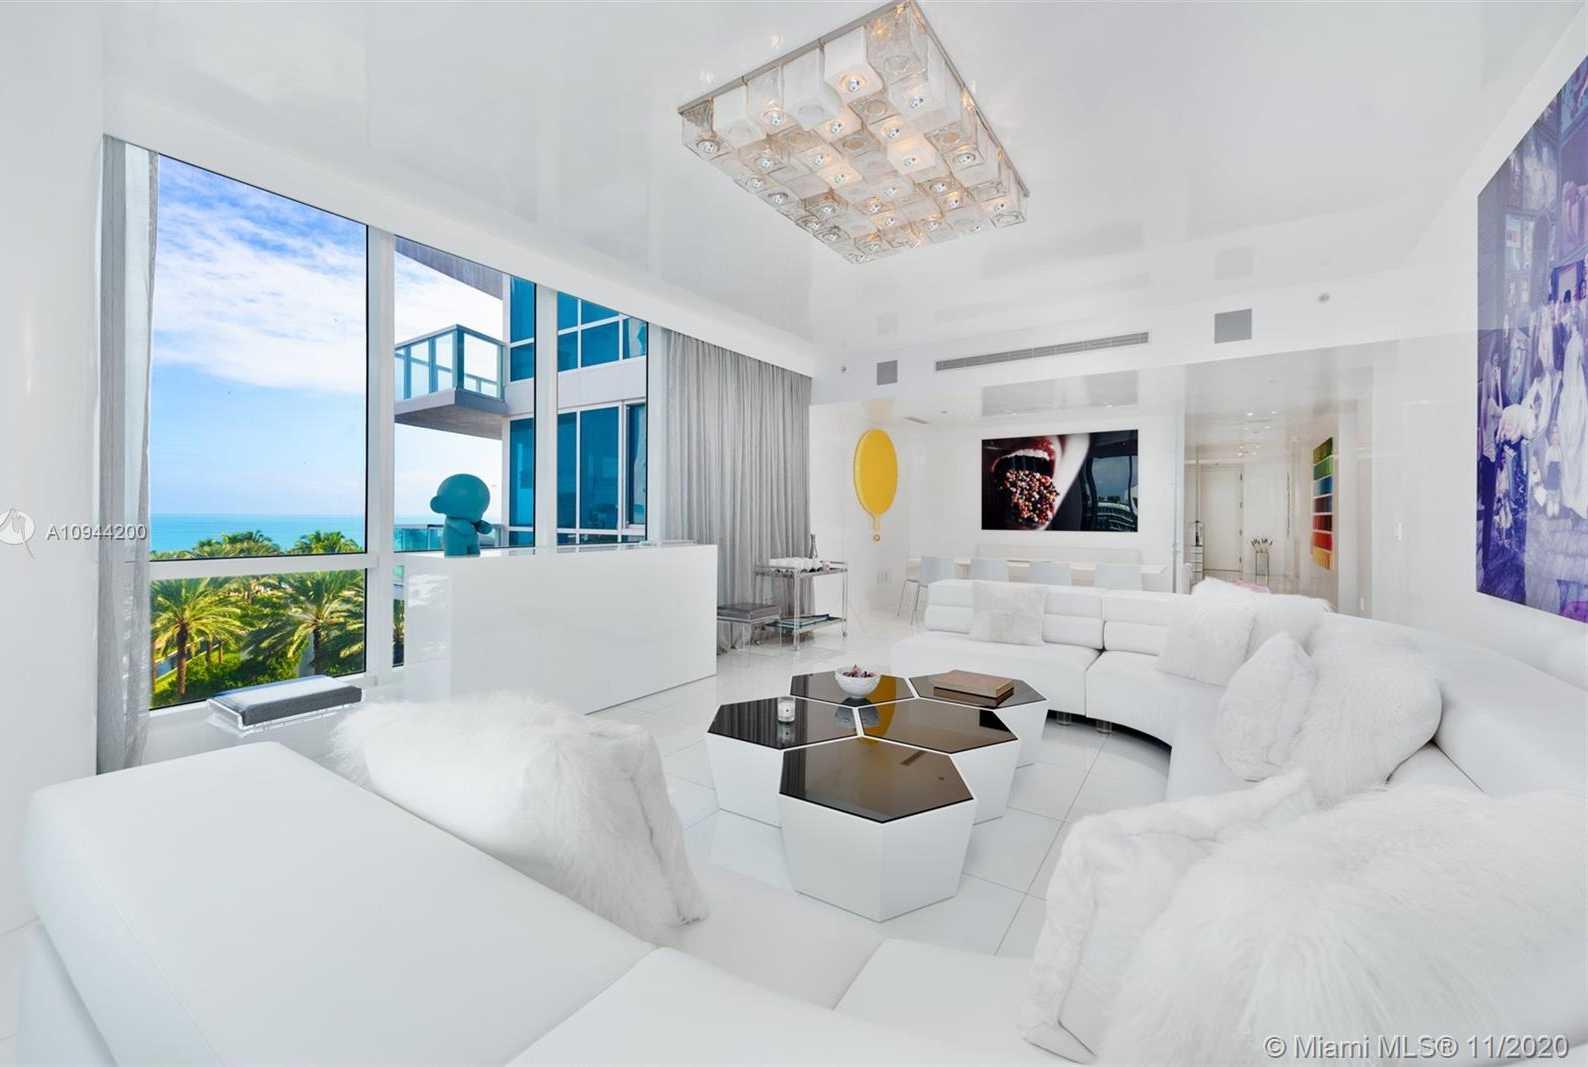 $3,800,000 - 3Br/3Ba -  for Sale in Continuum On South Beach, Miami Beach